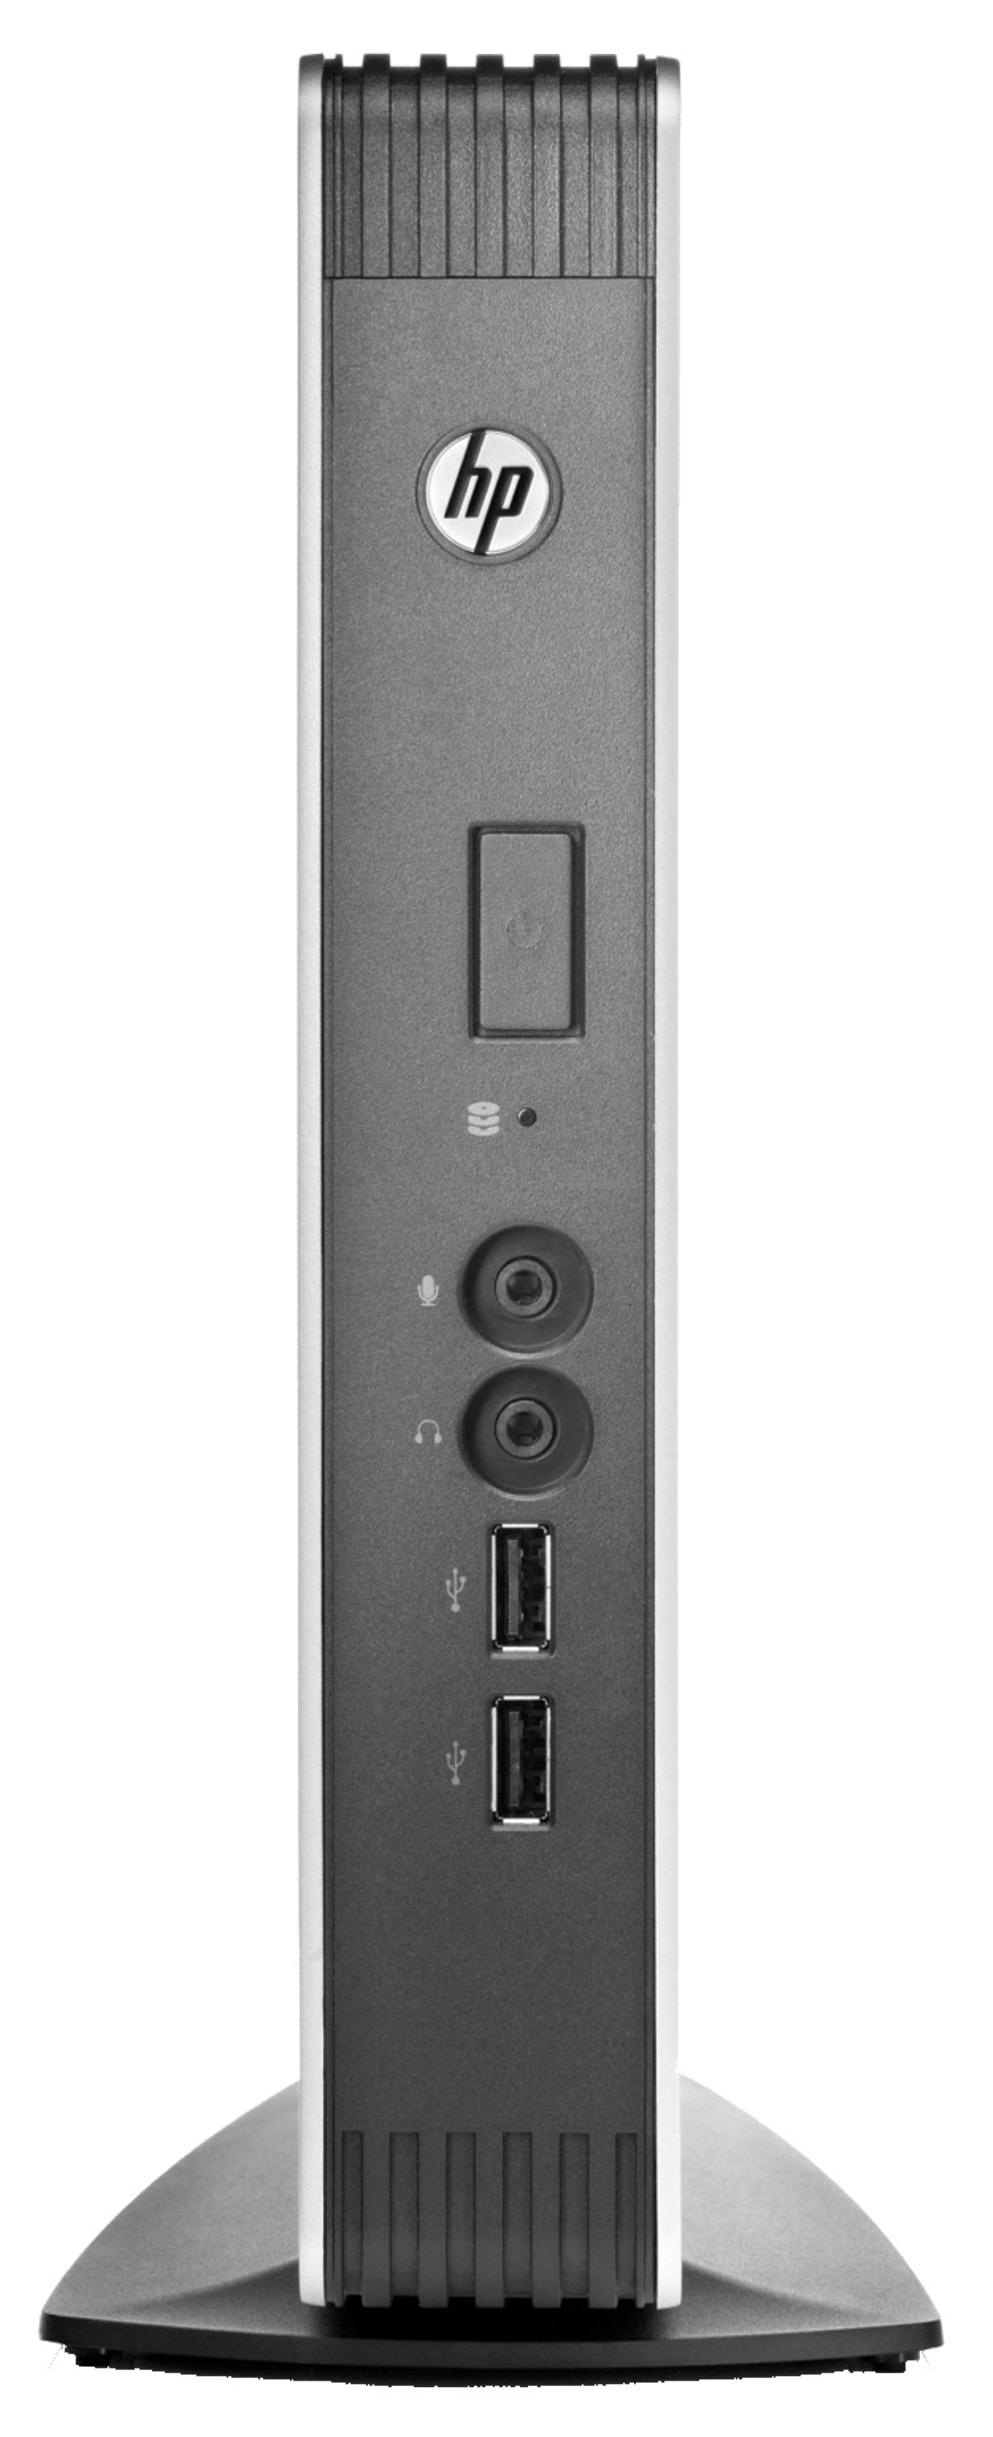 HP t610 PLUS Flexible Thin Client Dual Core (T56N) 1.65GHz 2GB 1GB Flash LAN HP ThinPro (Energy Star)